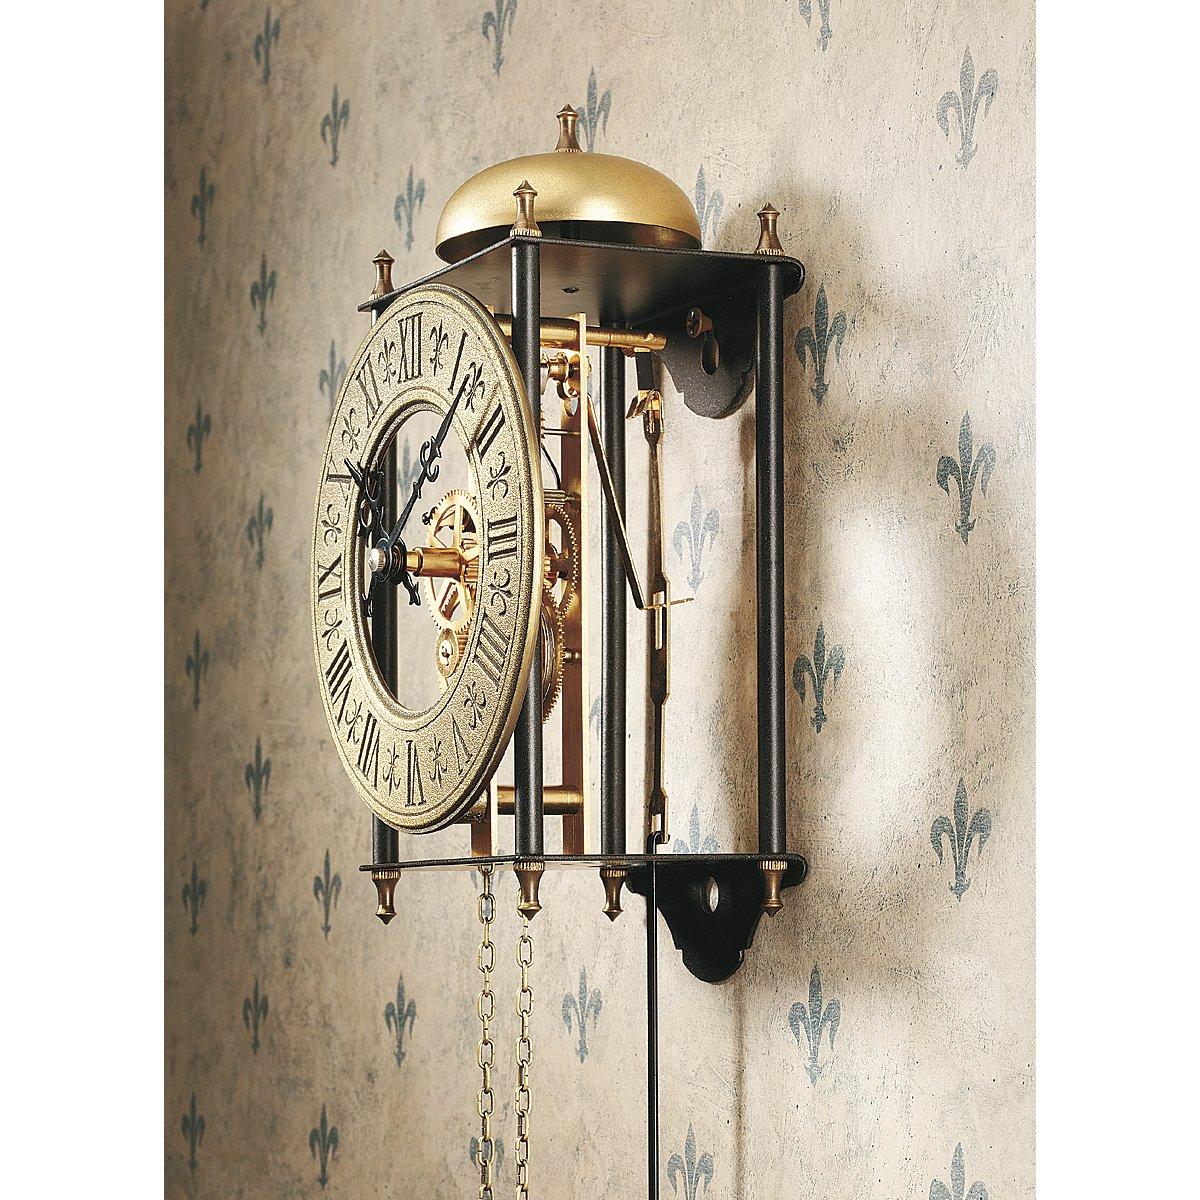 Design Toscano The Templeton Regulator Steampunk Decor Wall Clock, 66 Cm,  Metalware, Bronze Finish: Amazon.ca: Home U0026 Kitchen